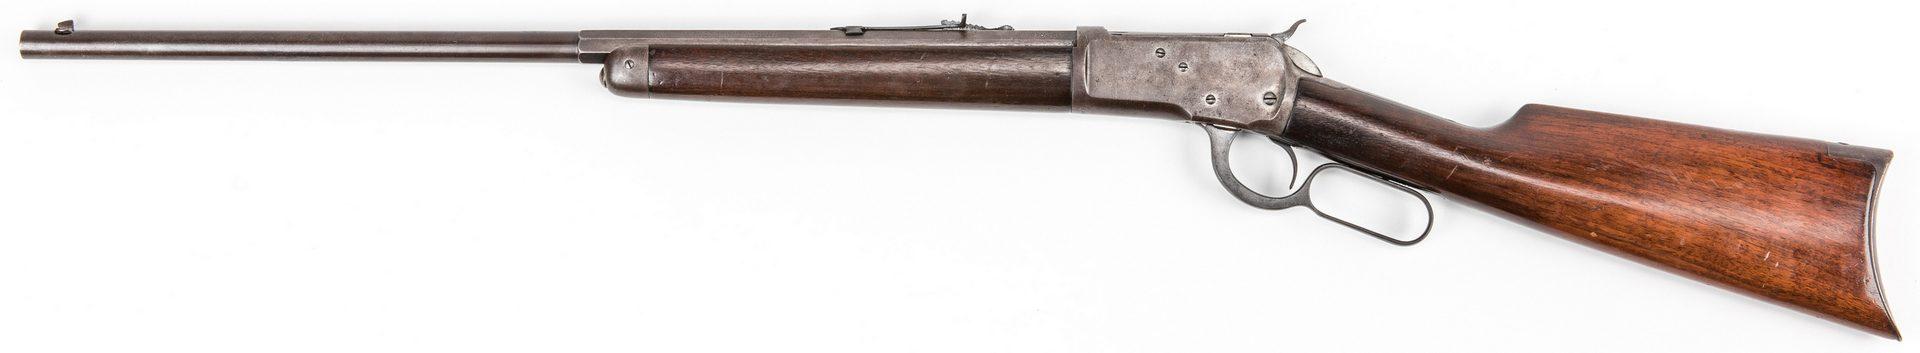 Lot 786: Model 1892 Winchester Rifle, .32 WCF. Octagonal Half Round Barrel